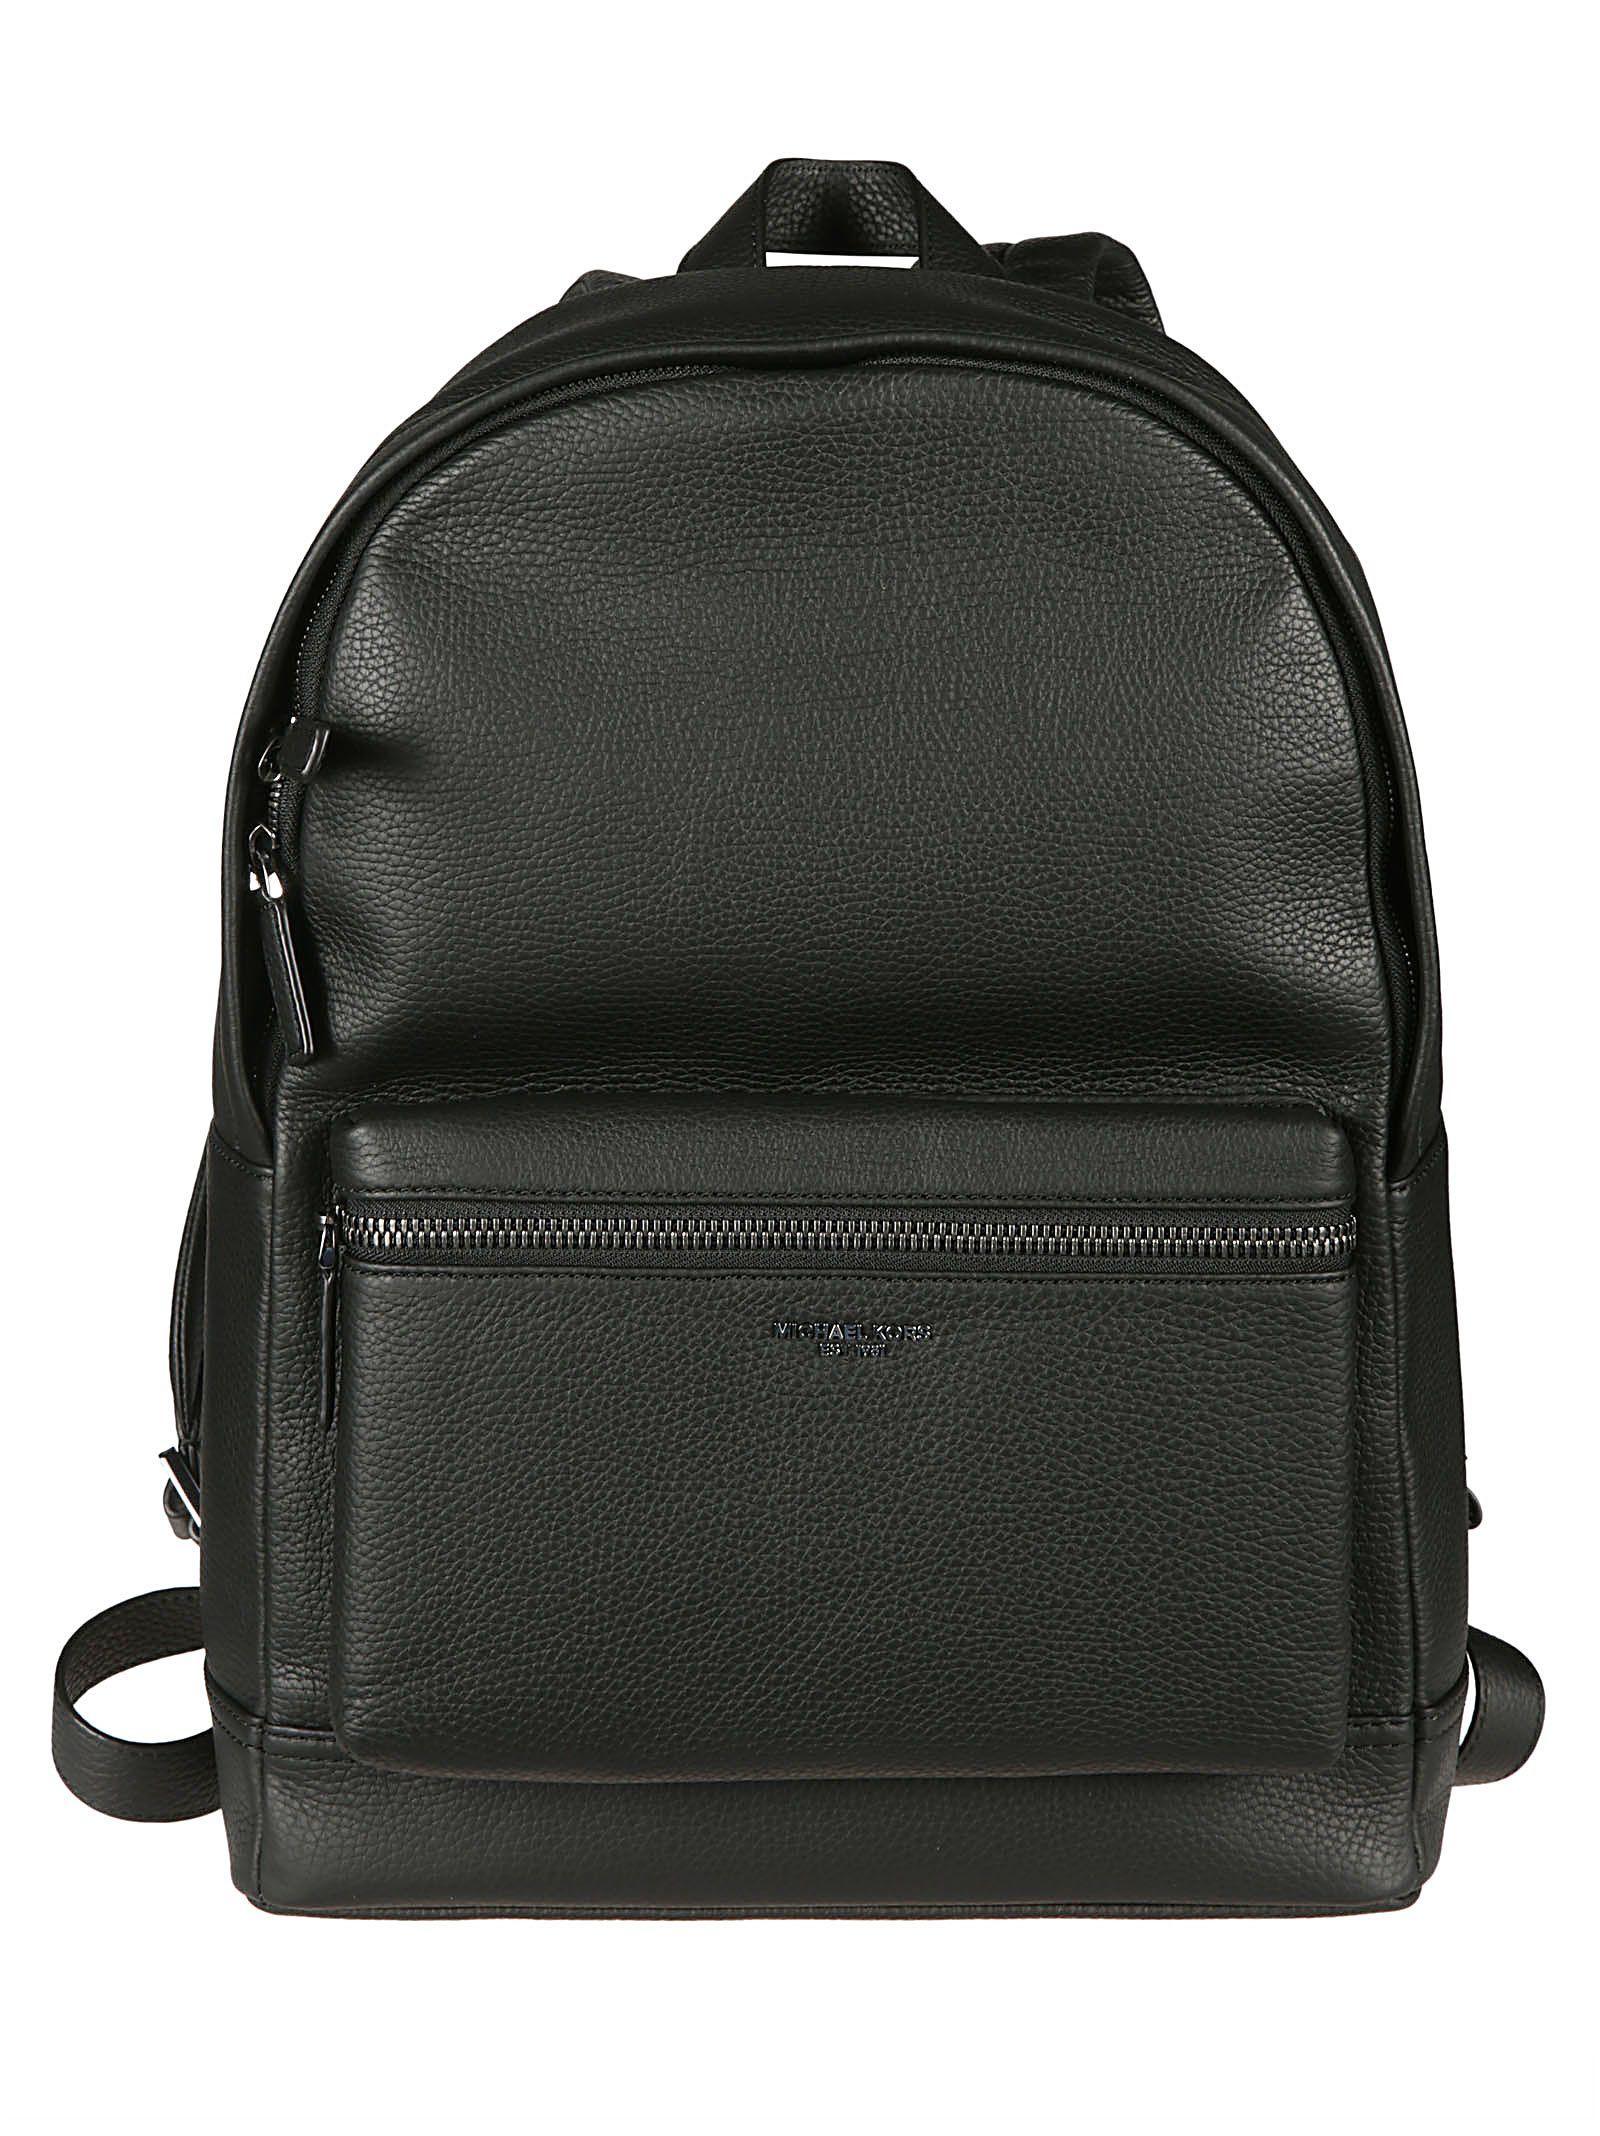 2d9ebdca7727 MICHAEL KORS BRYANT BACKPACK.  michaelkors  bags  leather  backpacks ...